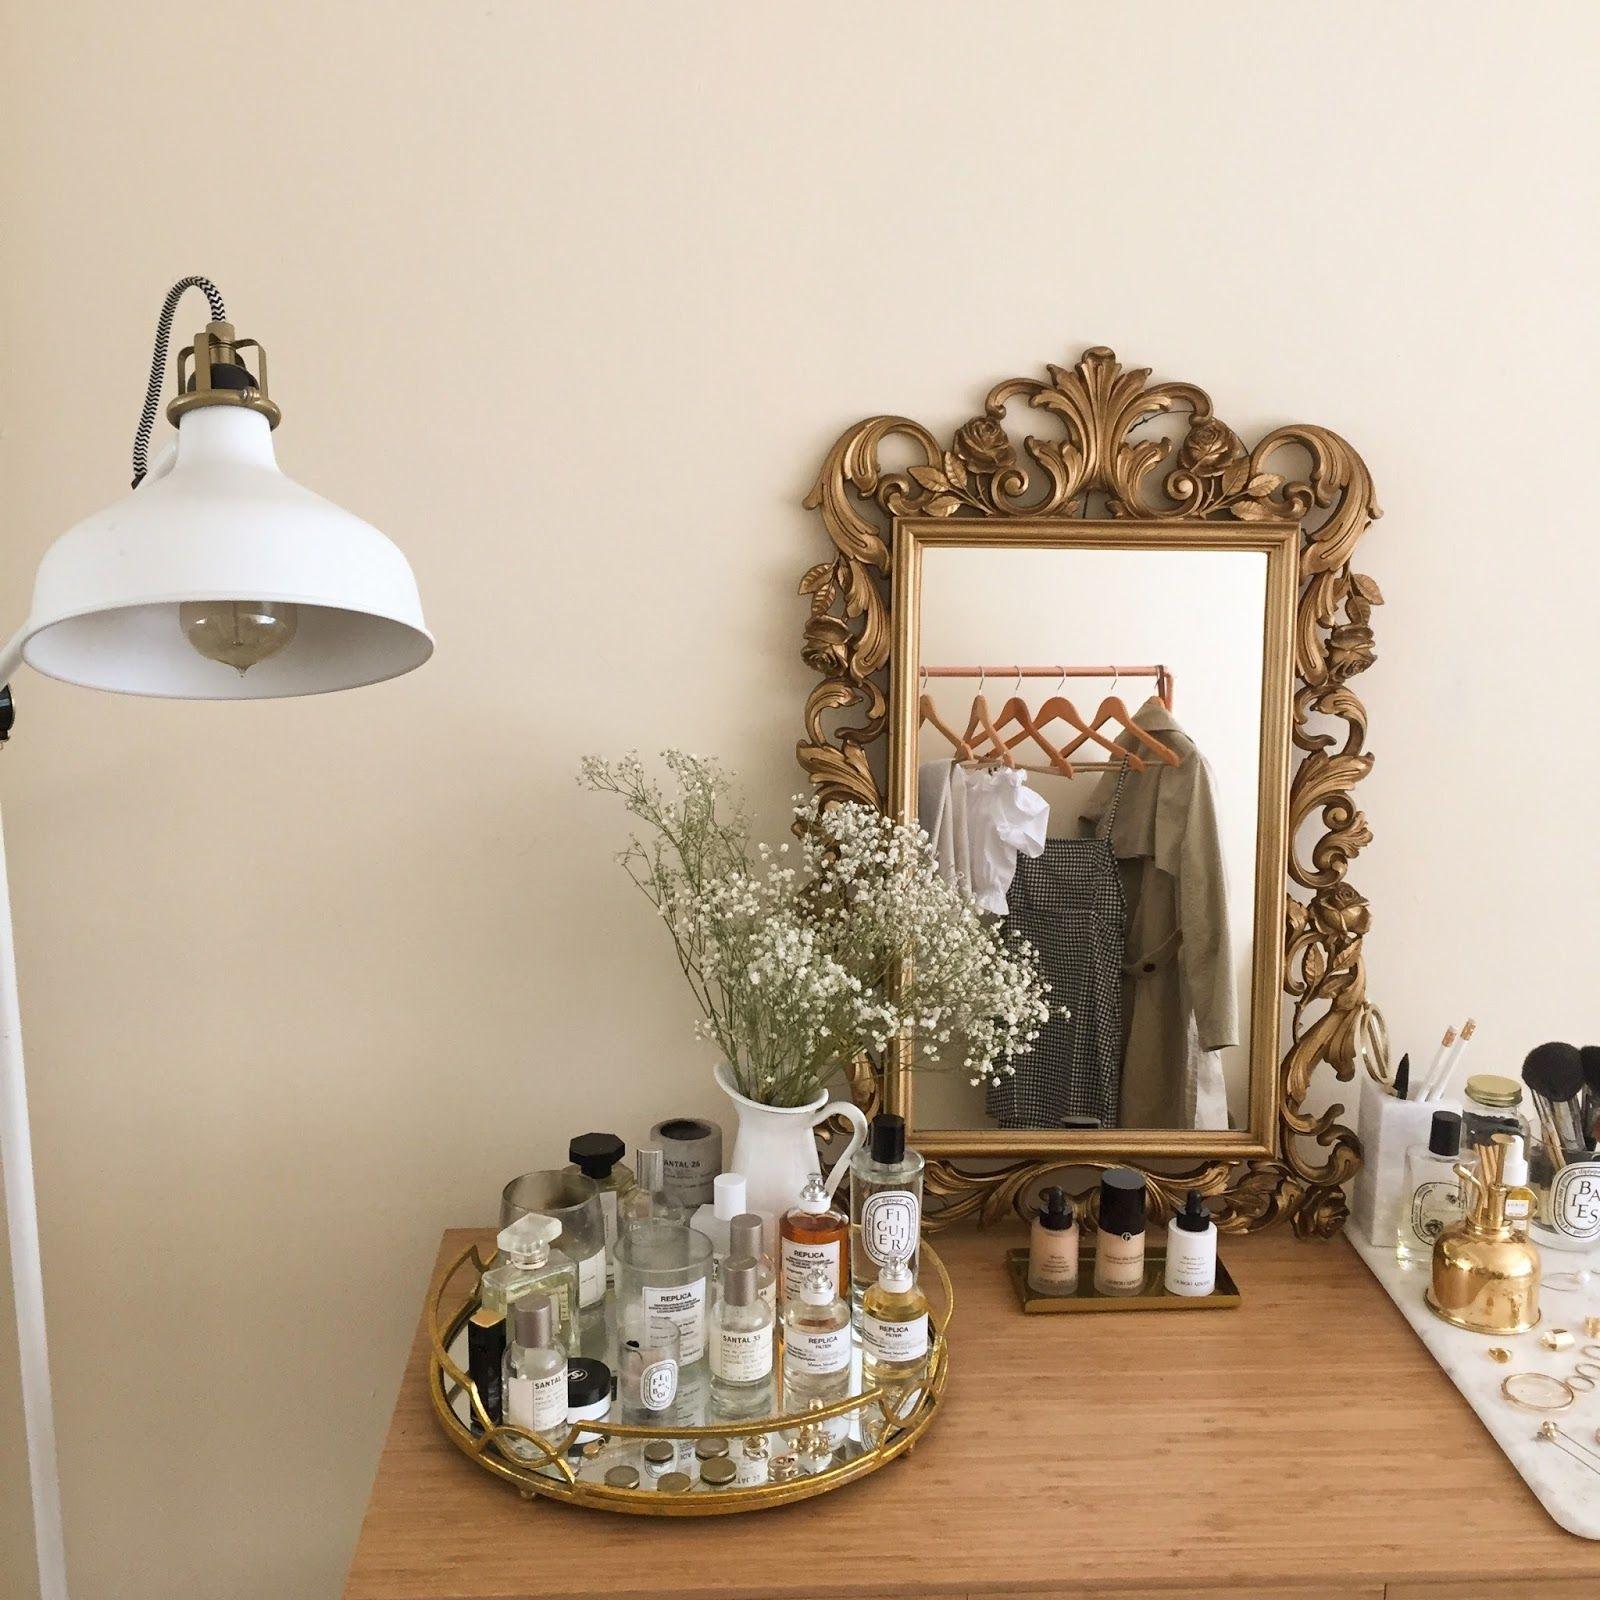 new interiors: the antique mirror | Decor - i love | Pinterest ...